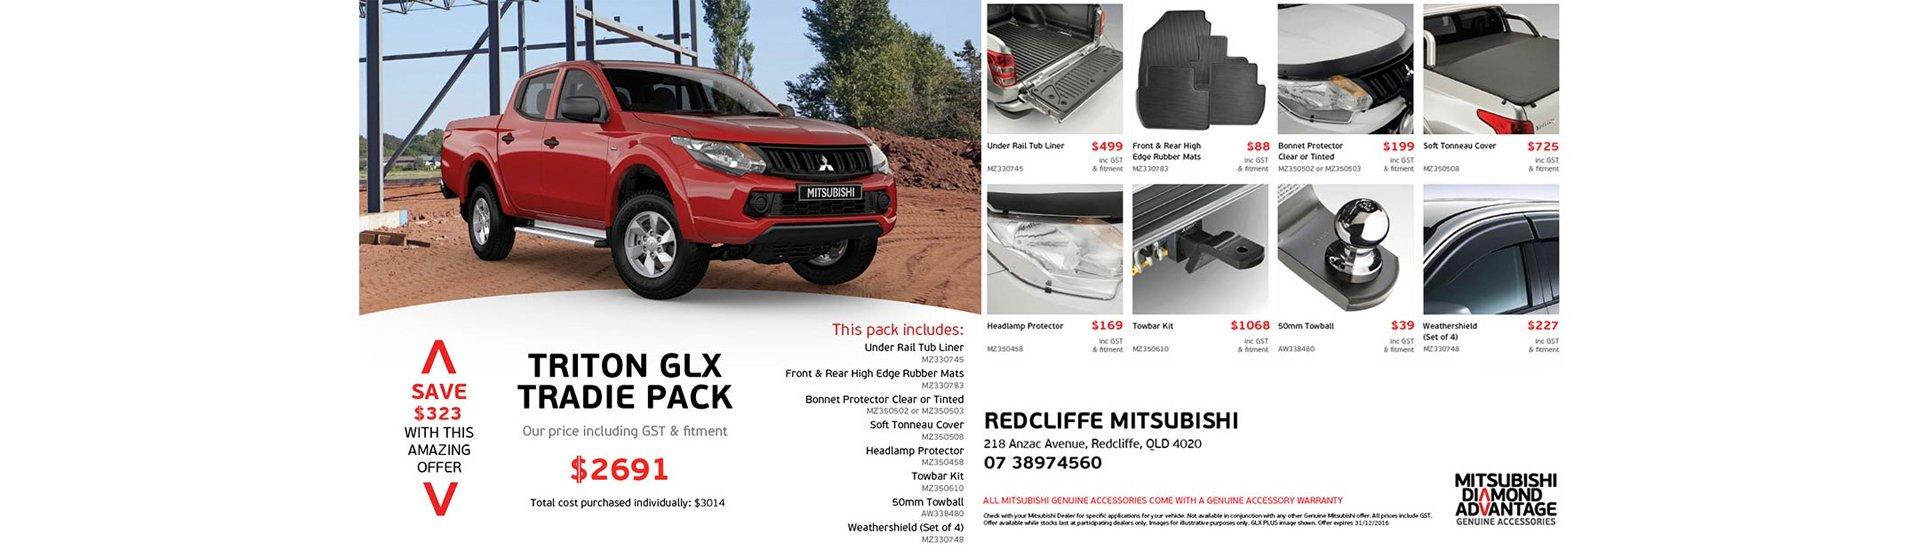 Mitsubishi Triton GLX Tradie Pack, exclusive to Redcliffe Mitsubishi Brisbane.